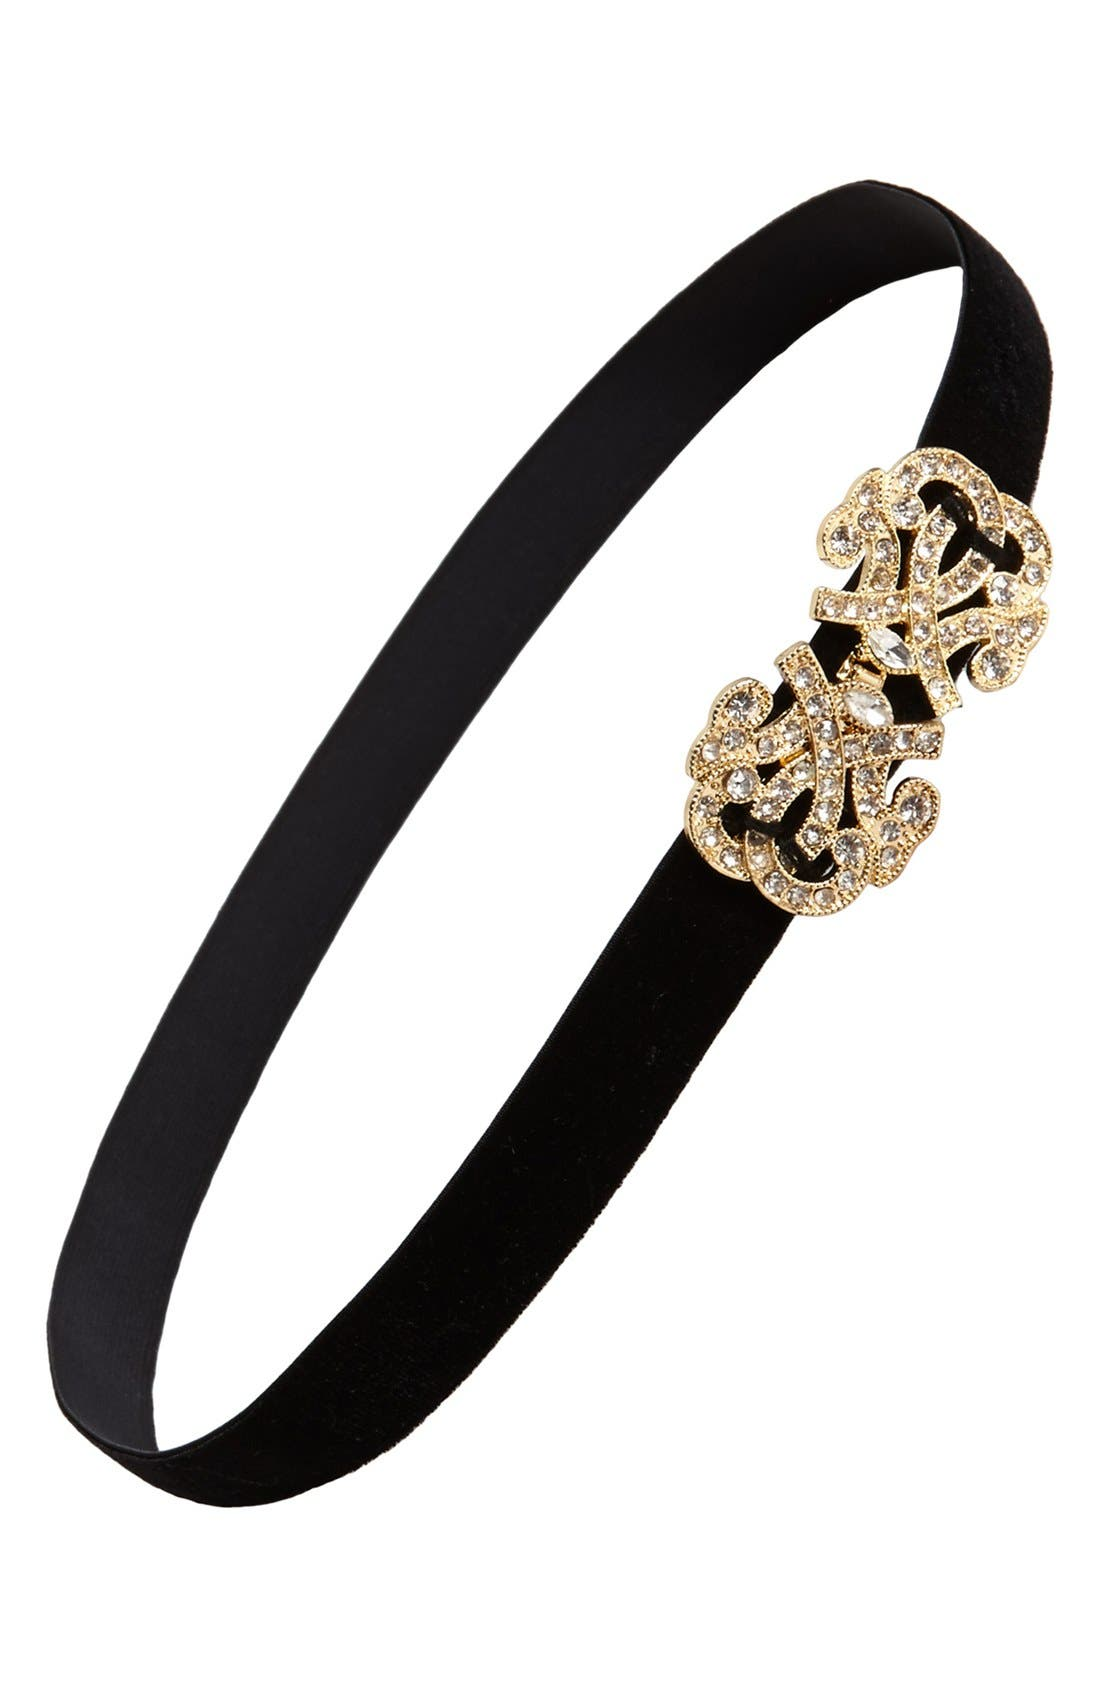 Main Image - Tildon 'Vintage Brocade' Headband